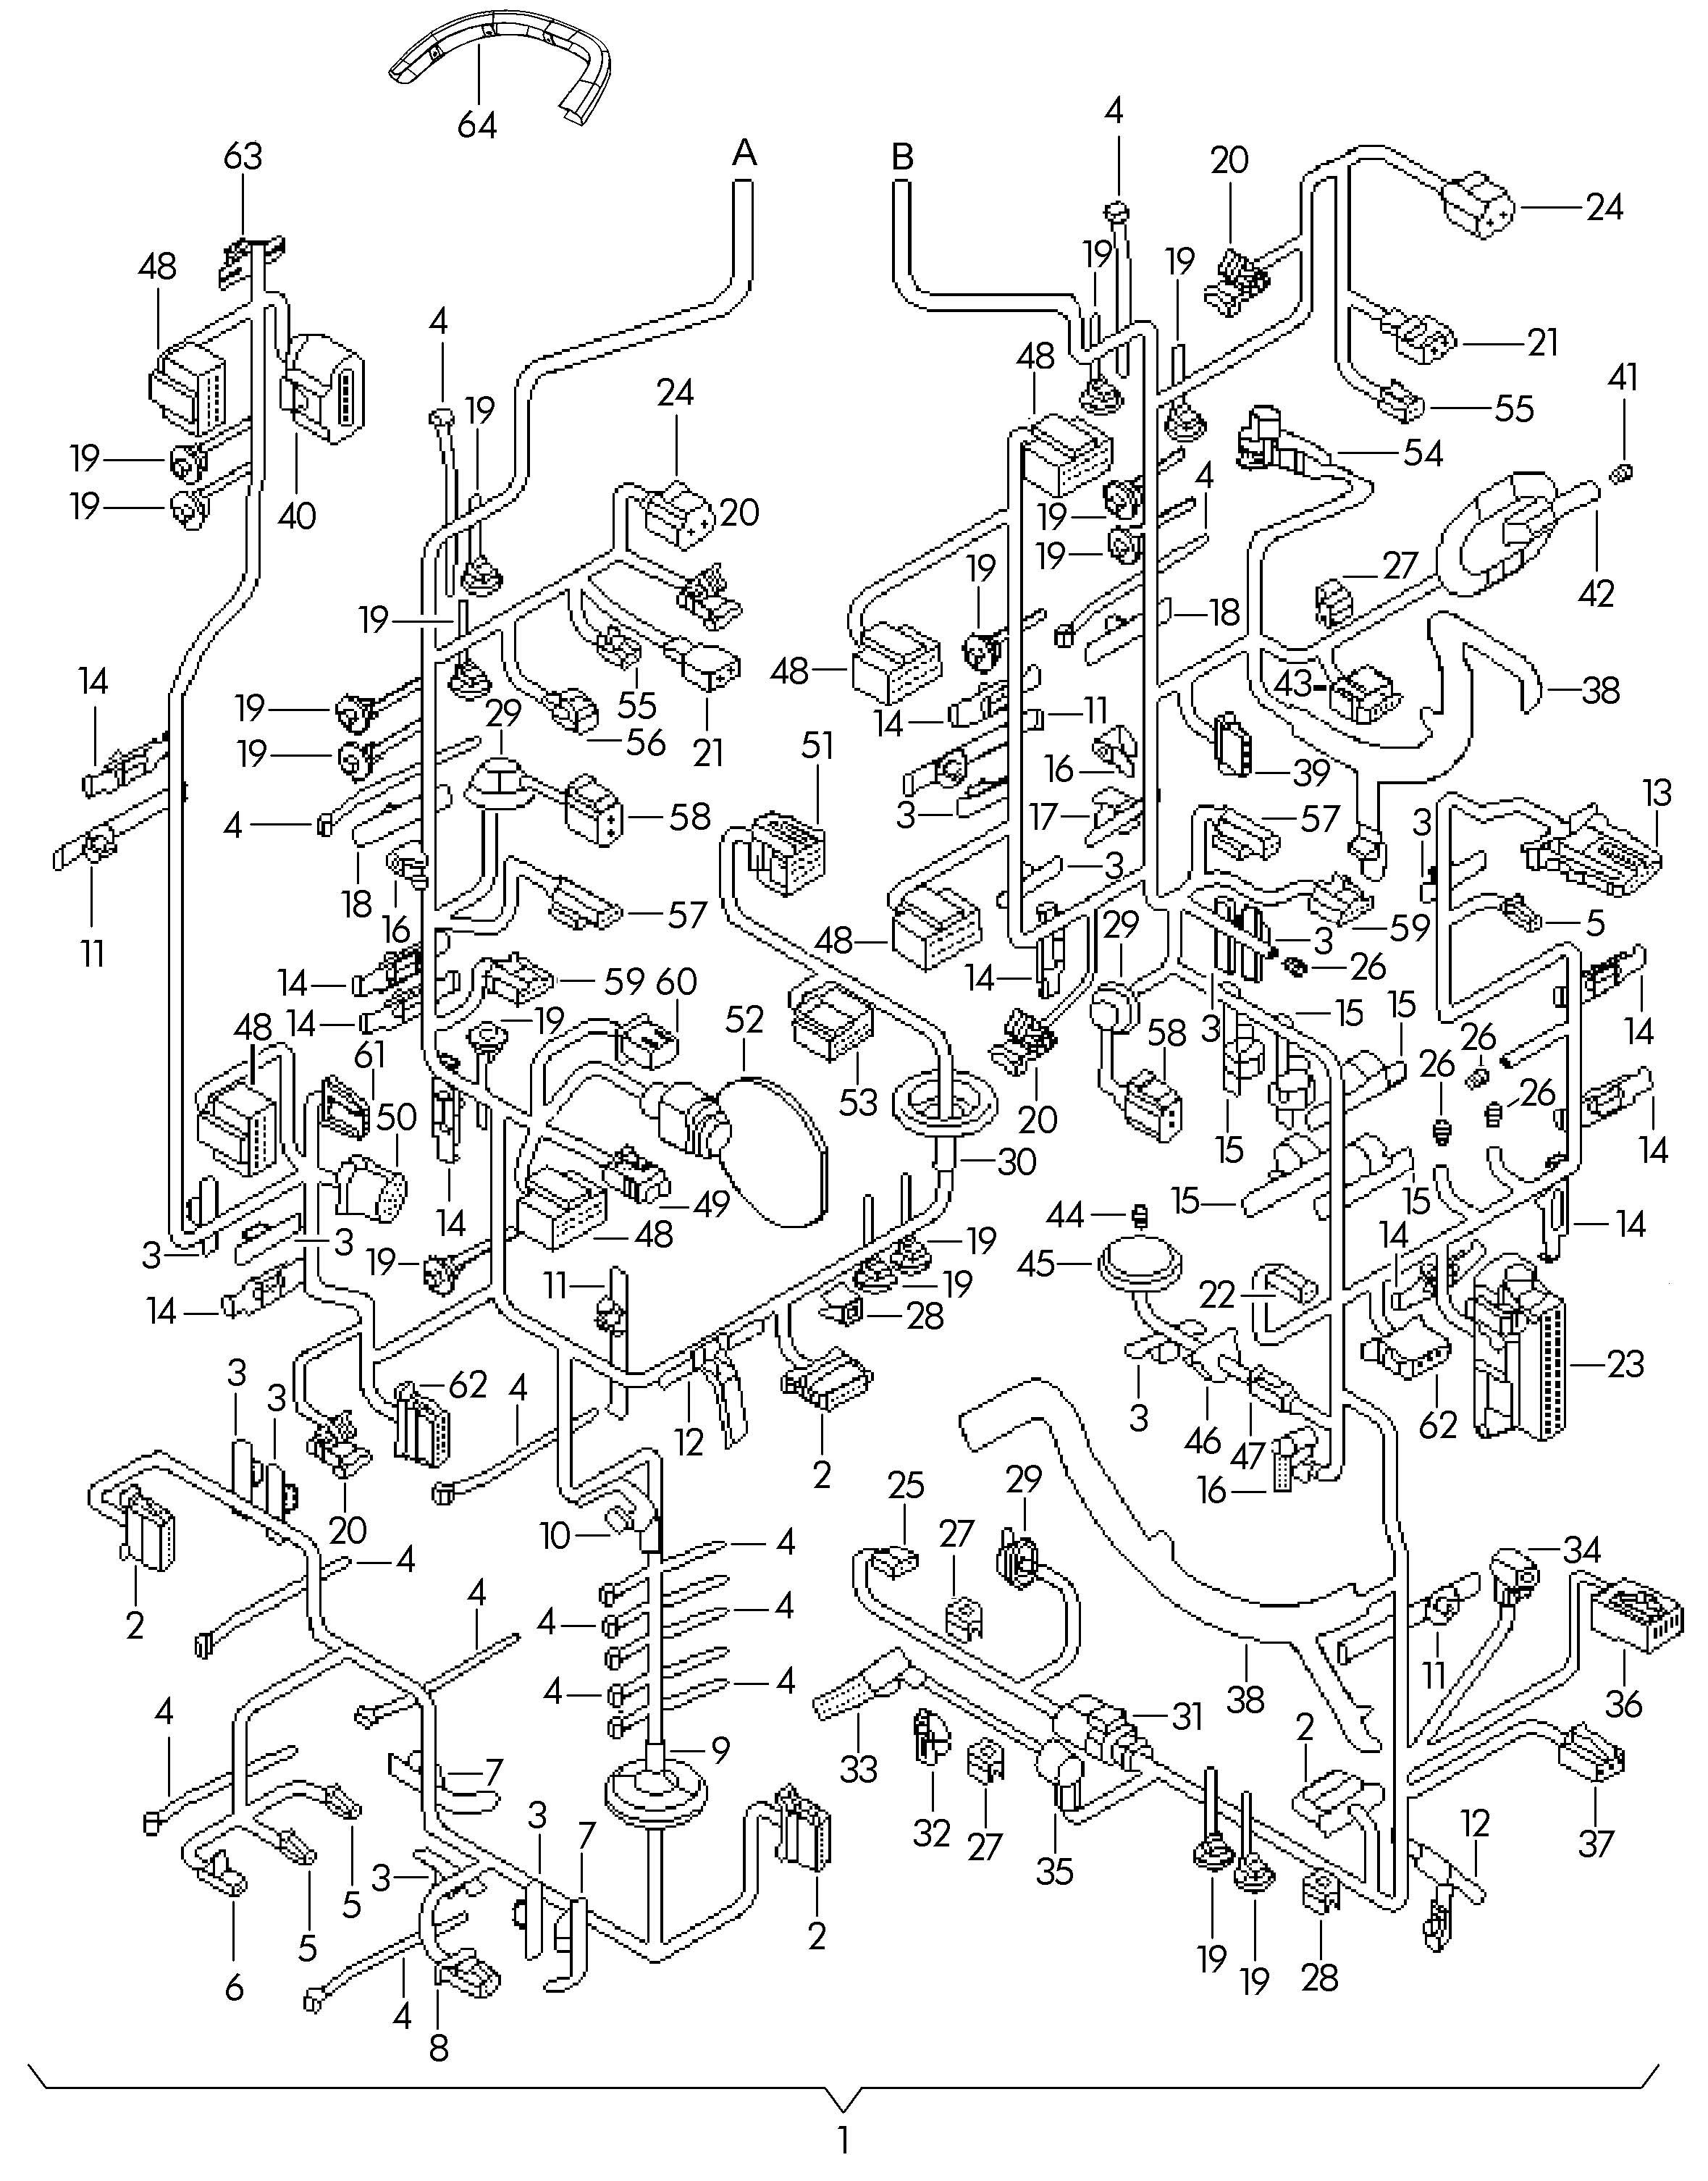 2012 vw jetta wiring diagram view diagram